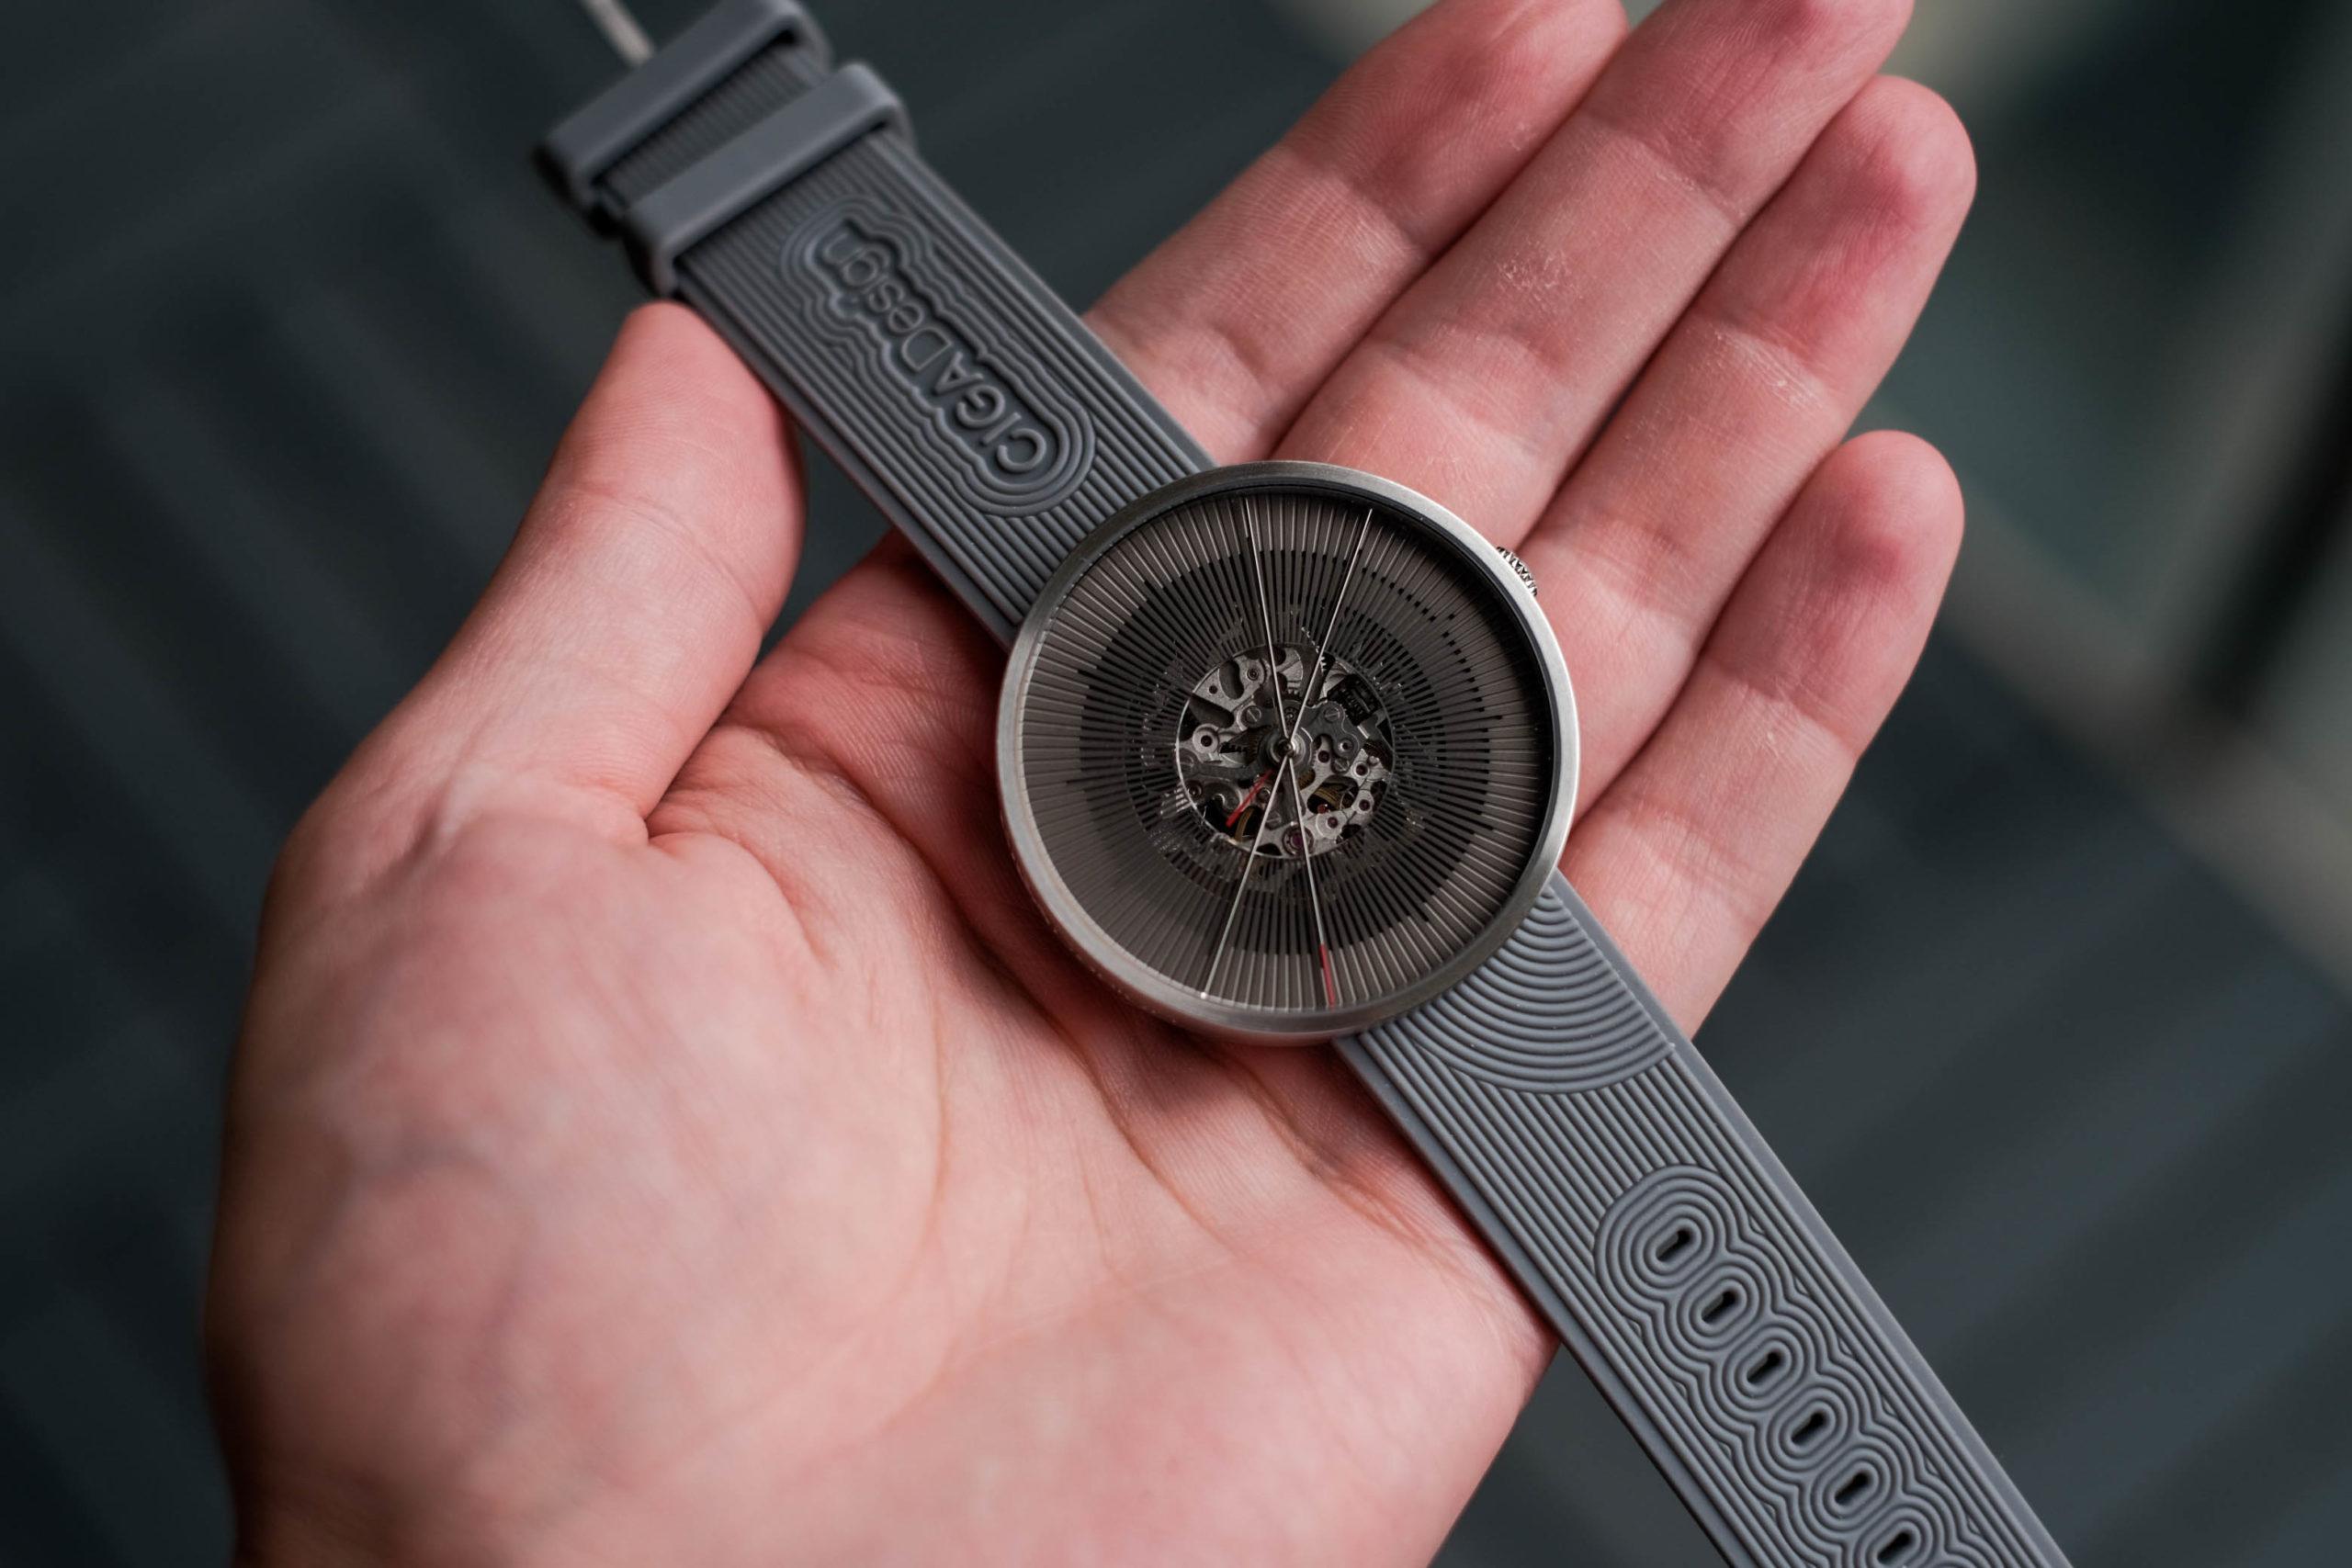 Ciga Design J Series Watch Review